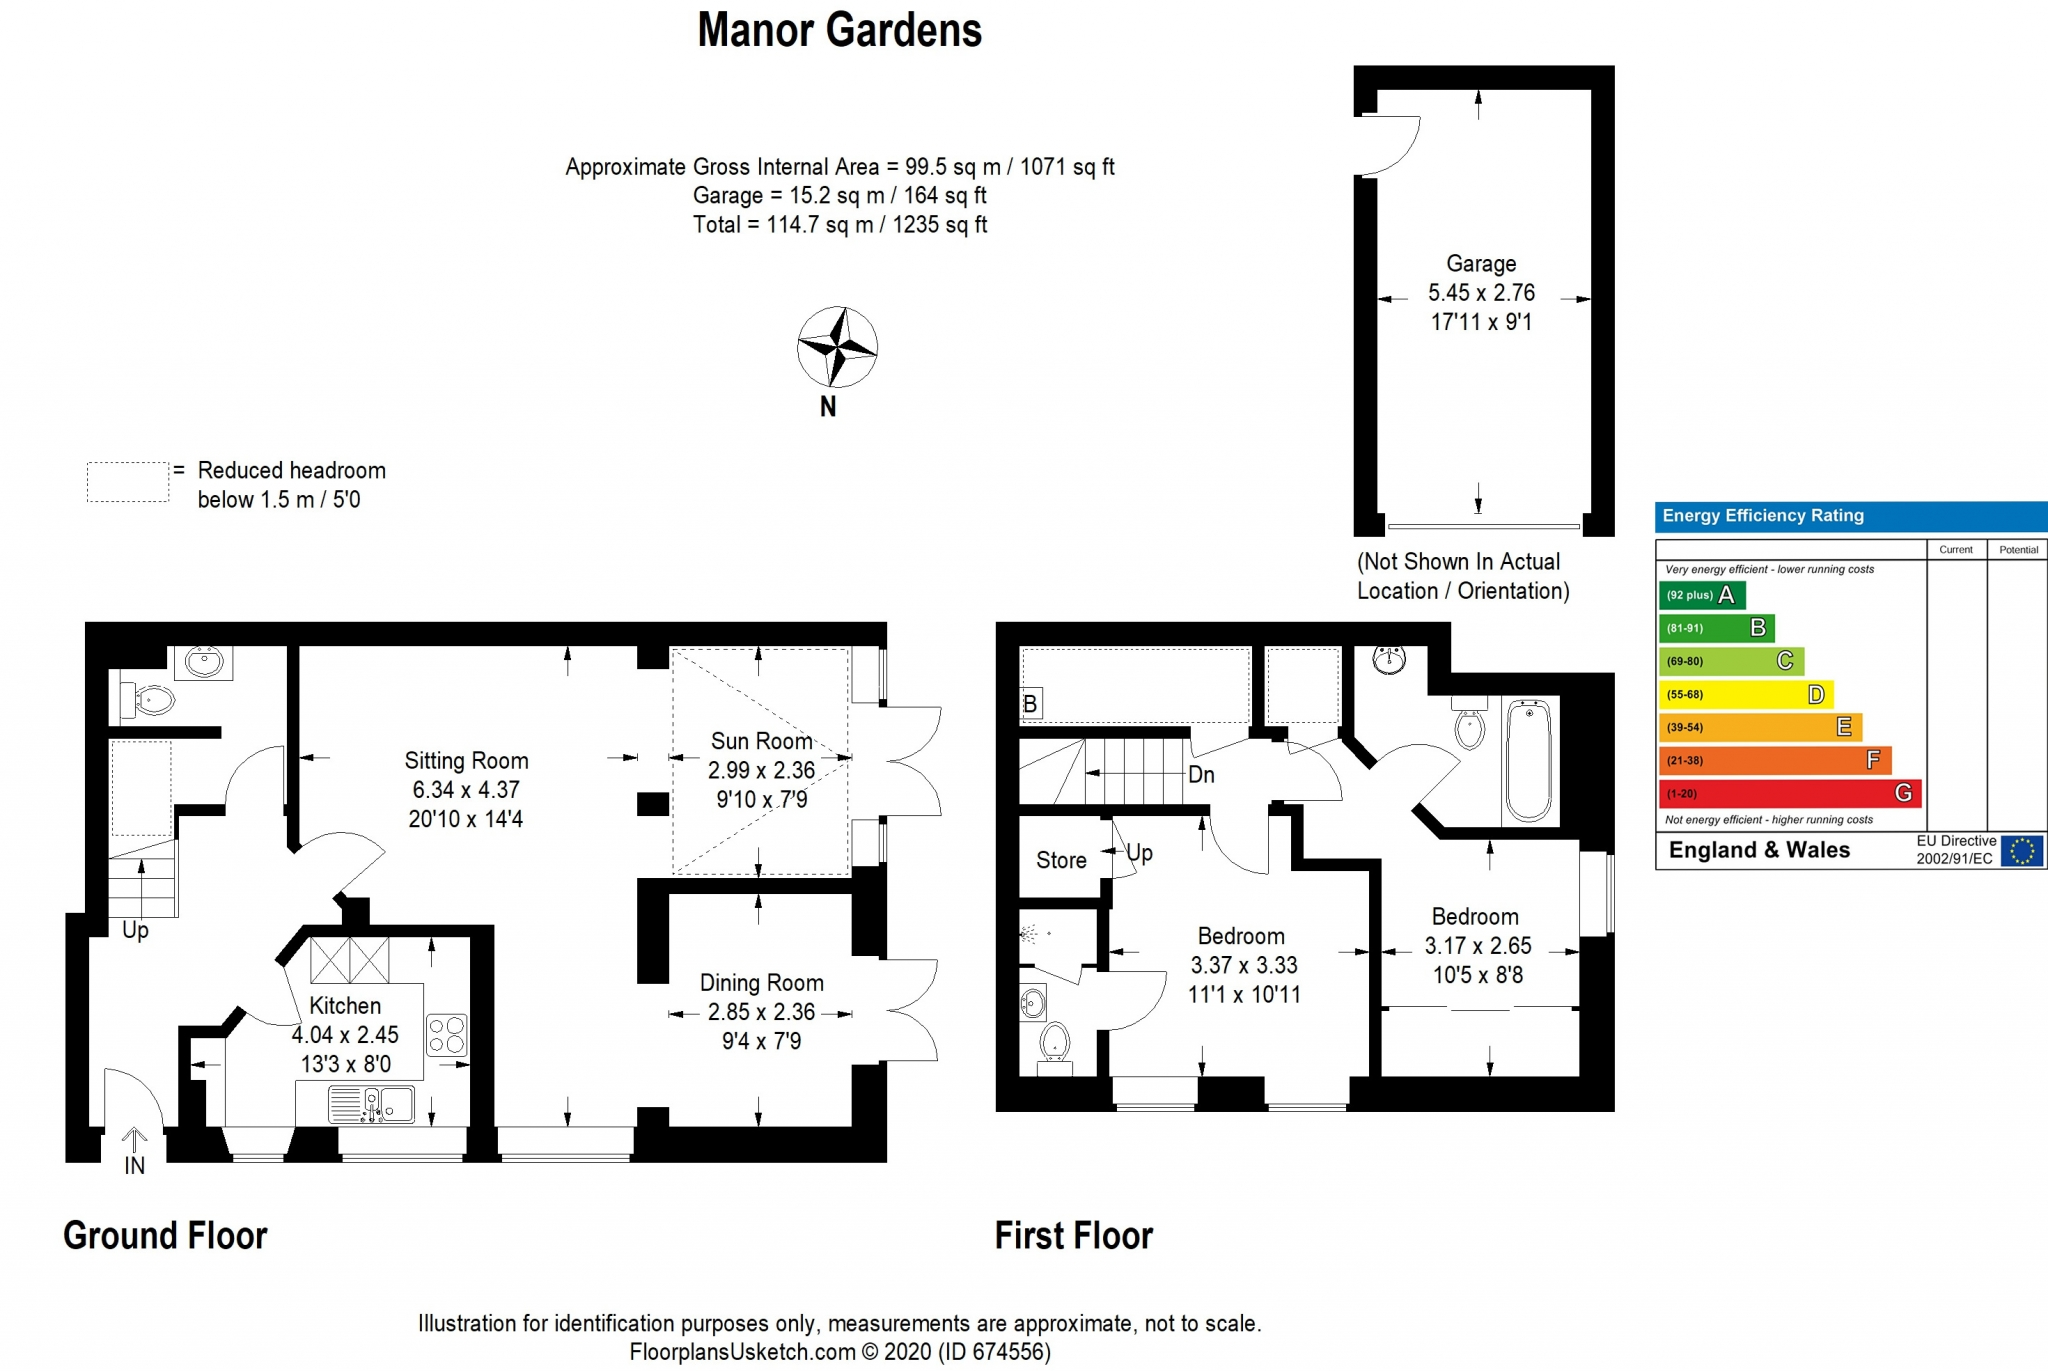 Final_674556_Manor-Gardens-B_190820104129181